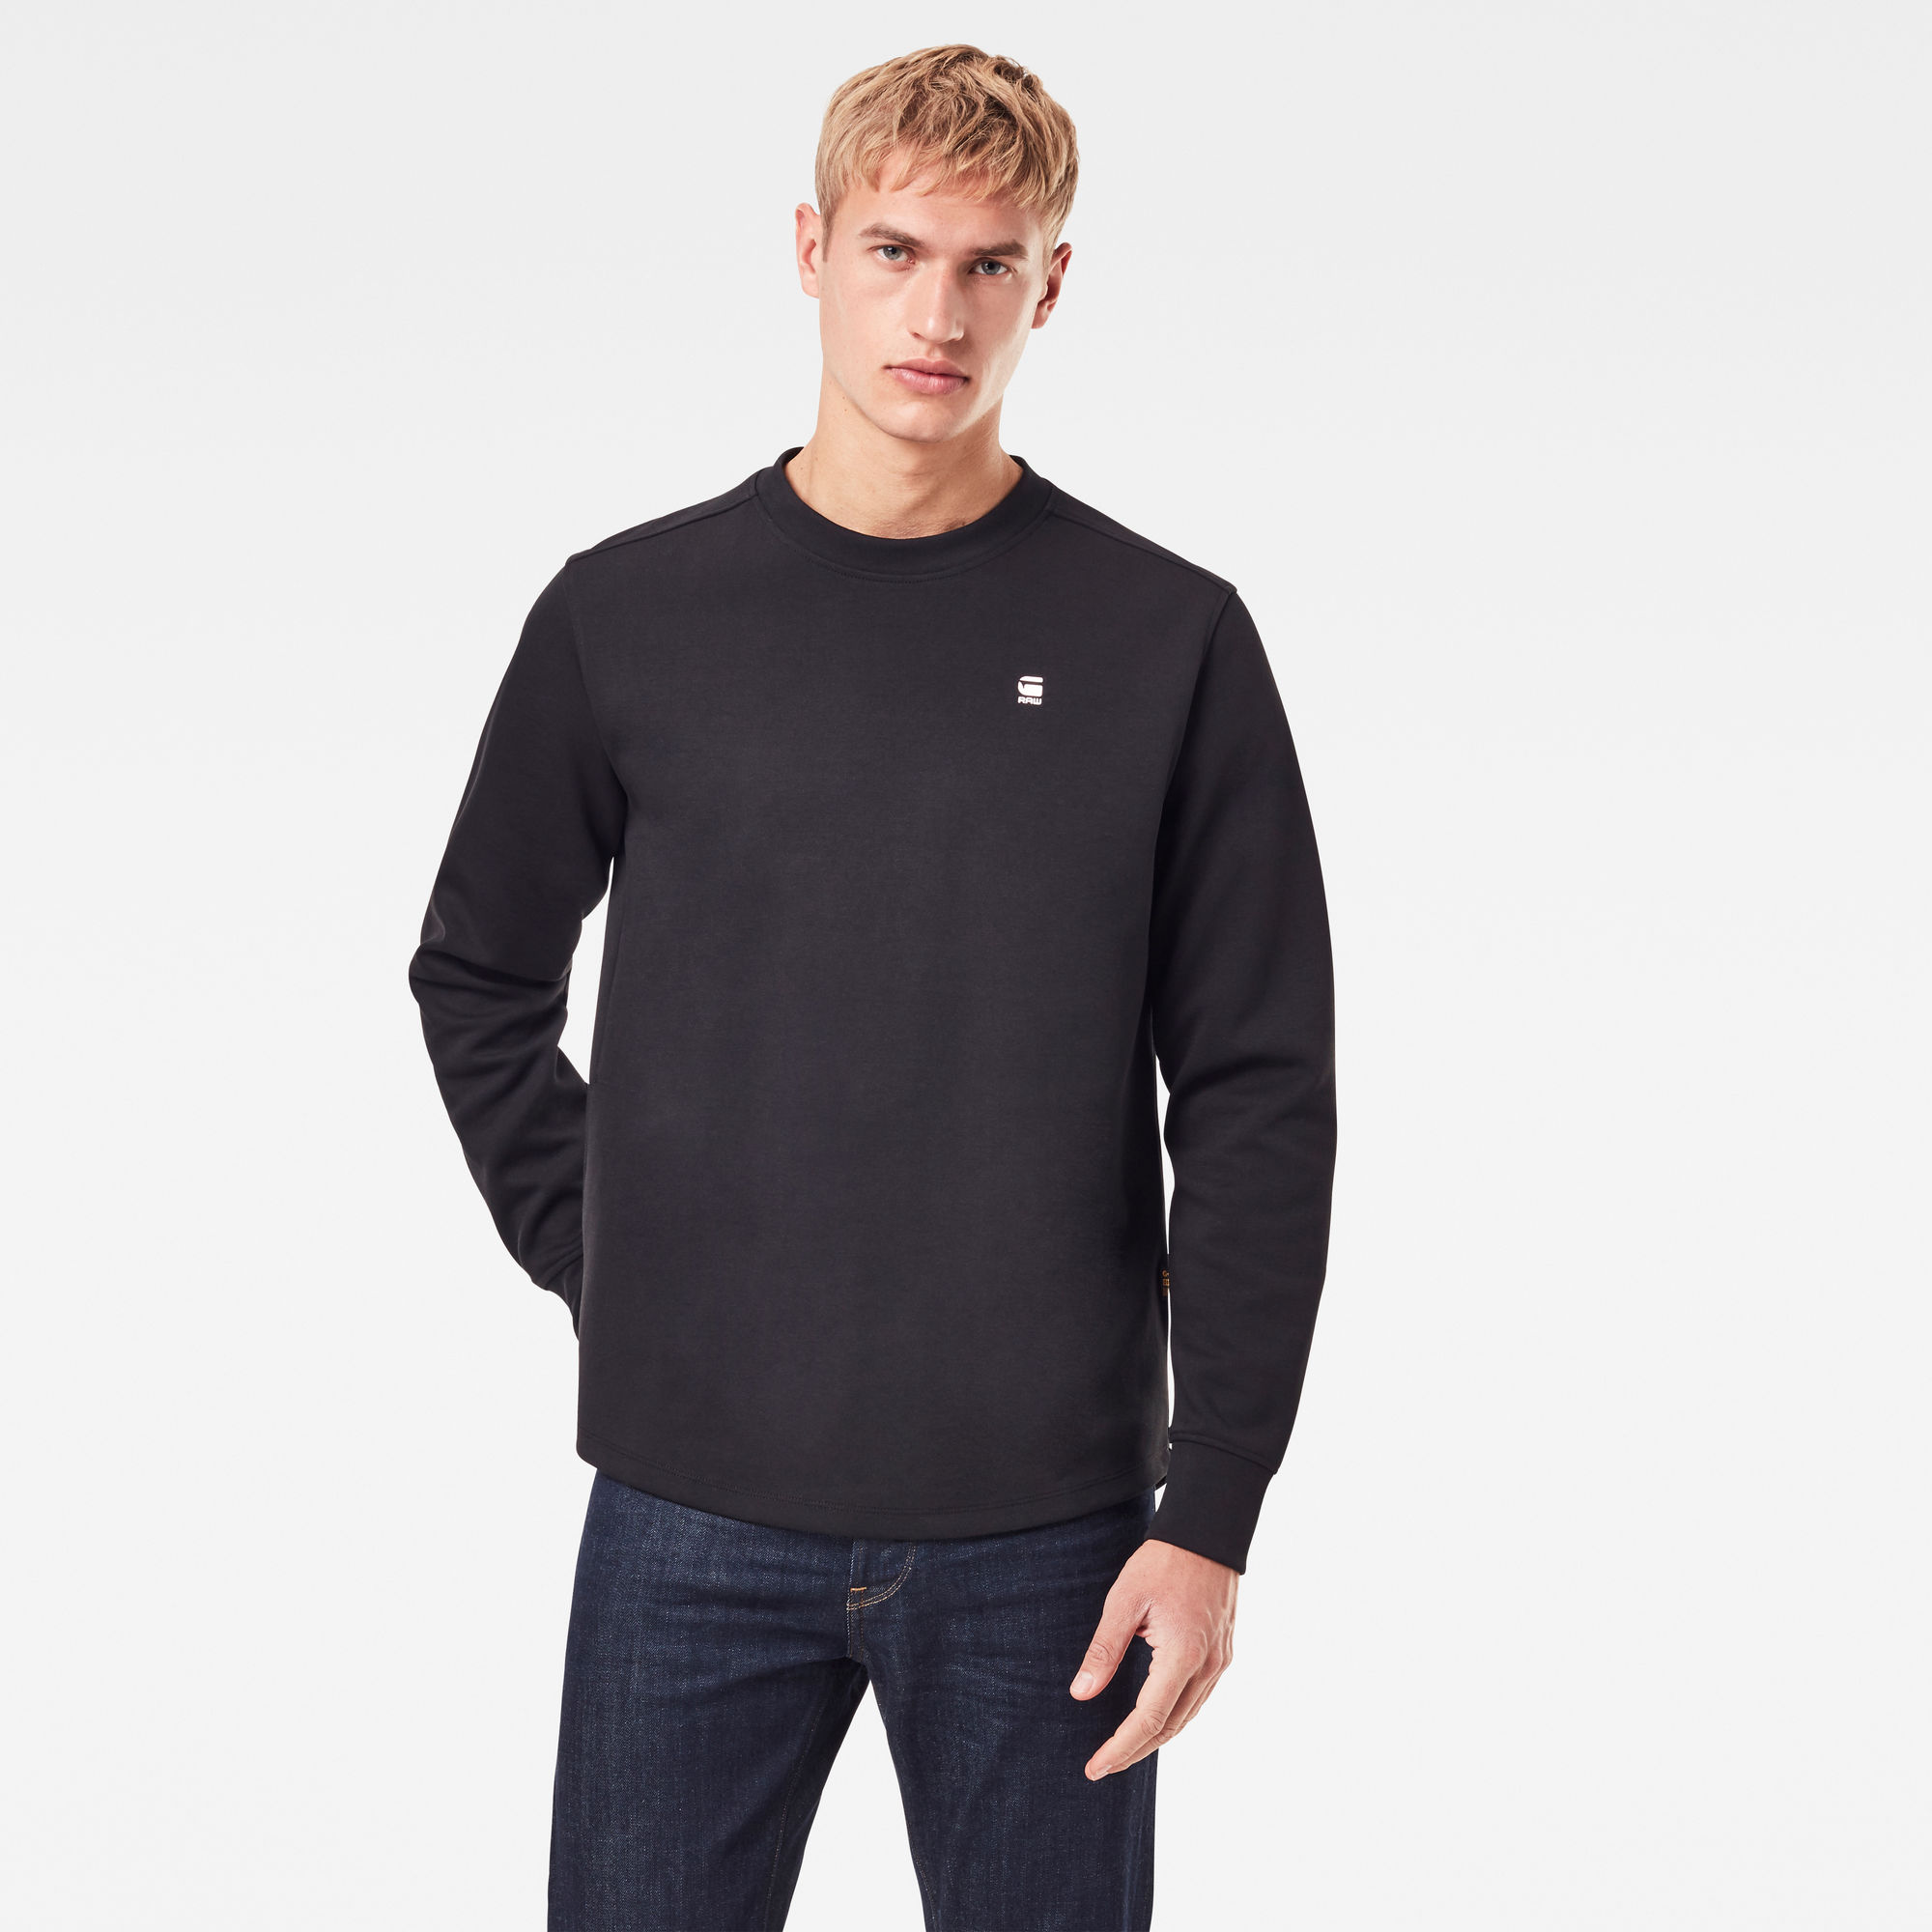 G-Star RAW Heren Lash Sweater Zwart